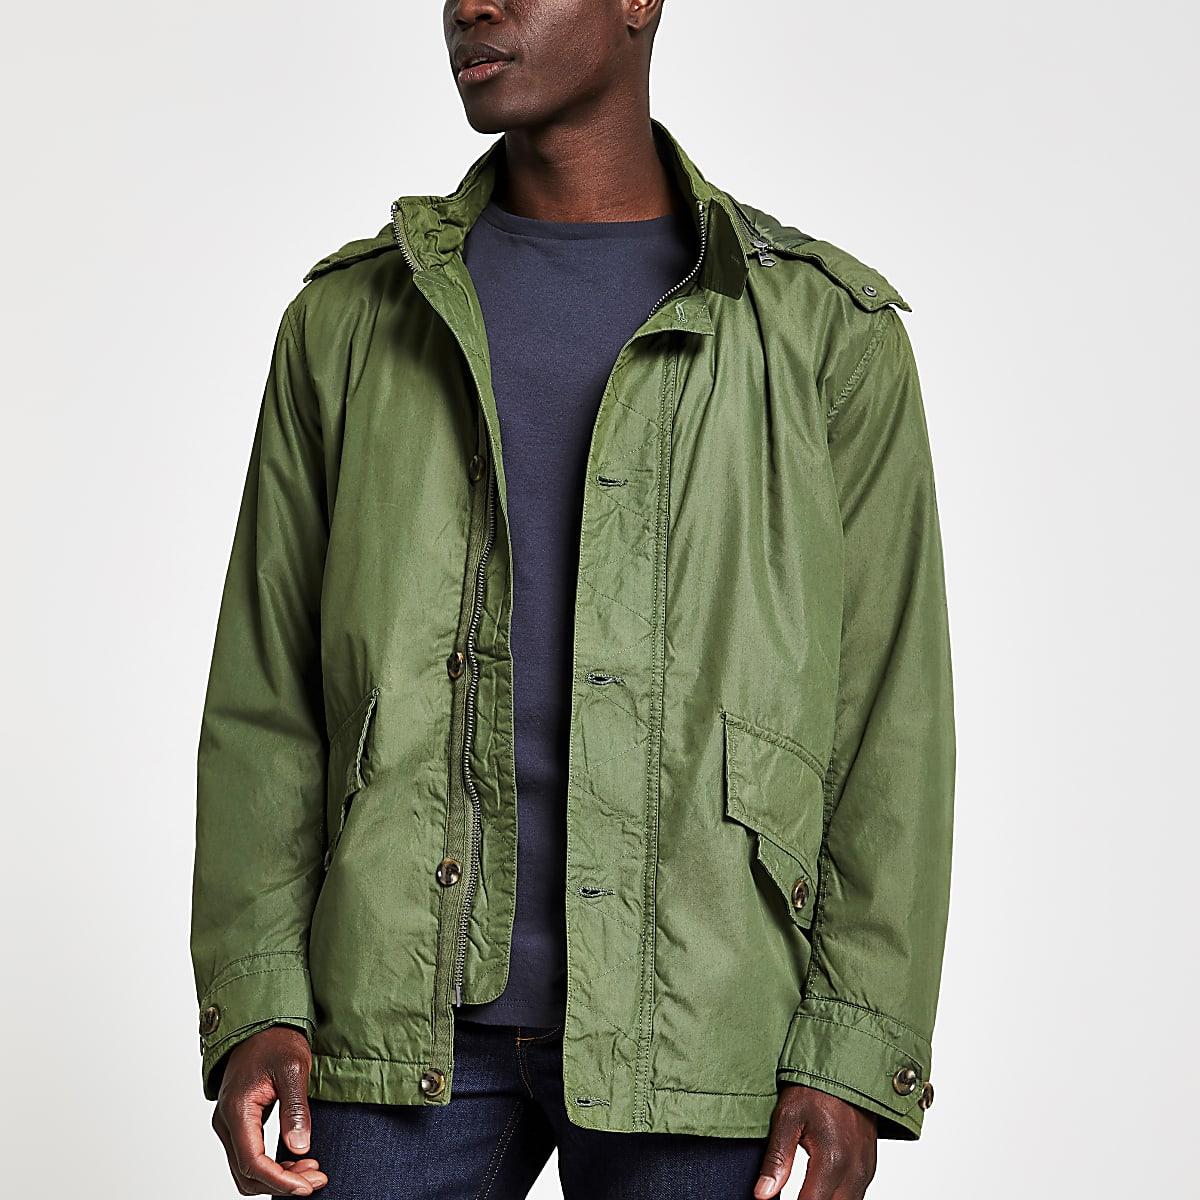 Pepe Jeans - Groen lichtgewicht jack